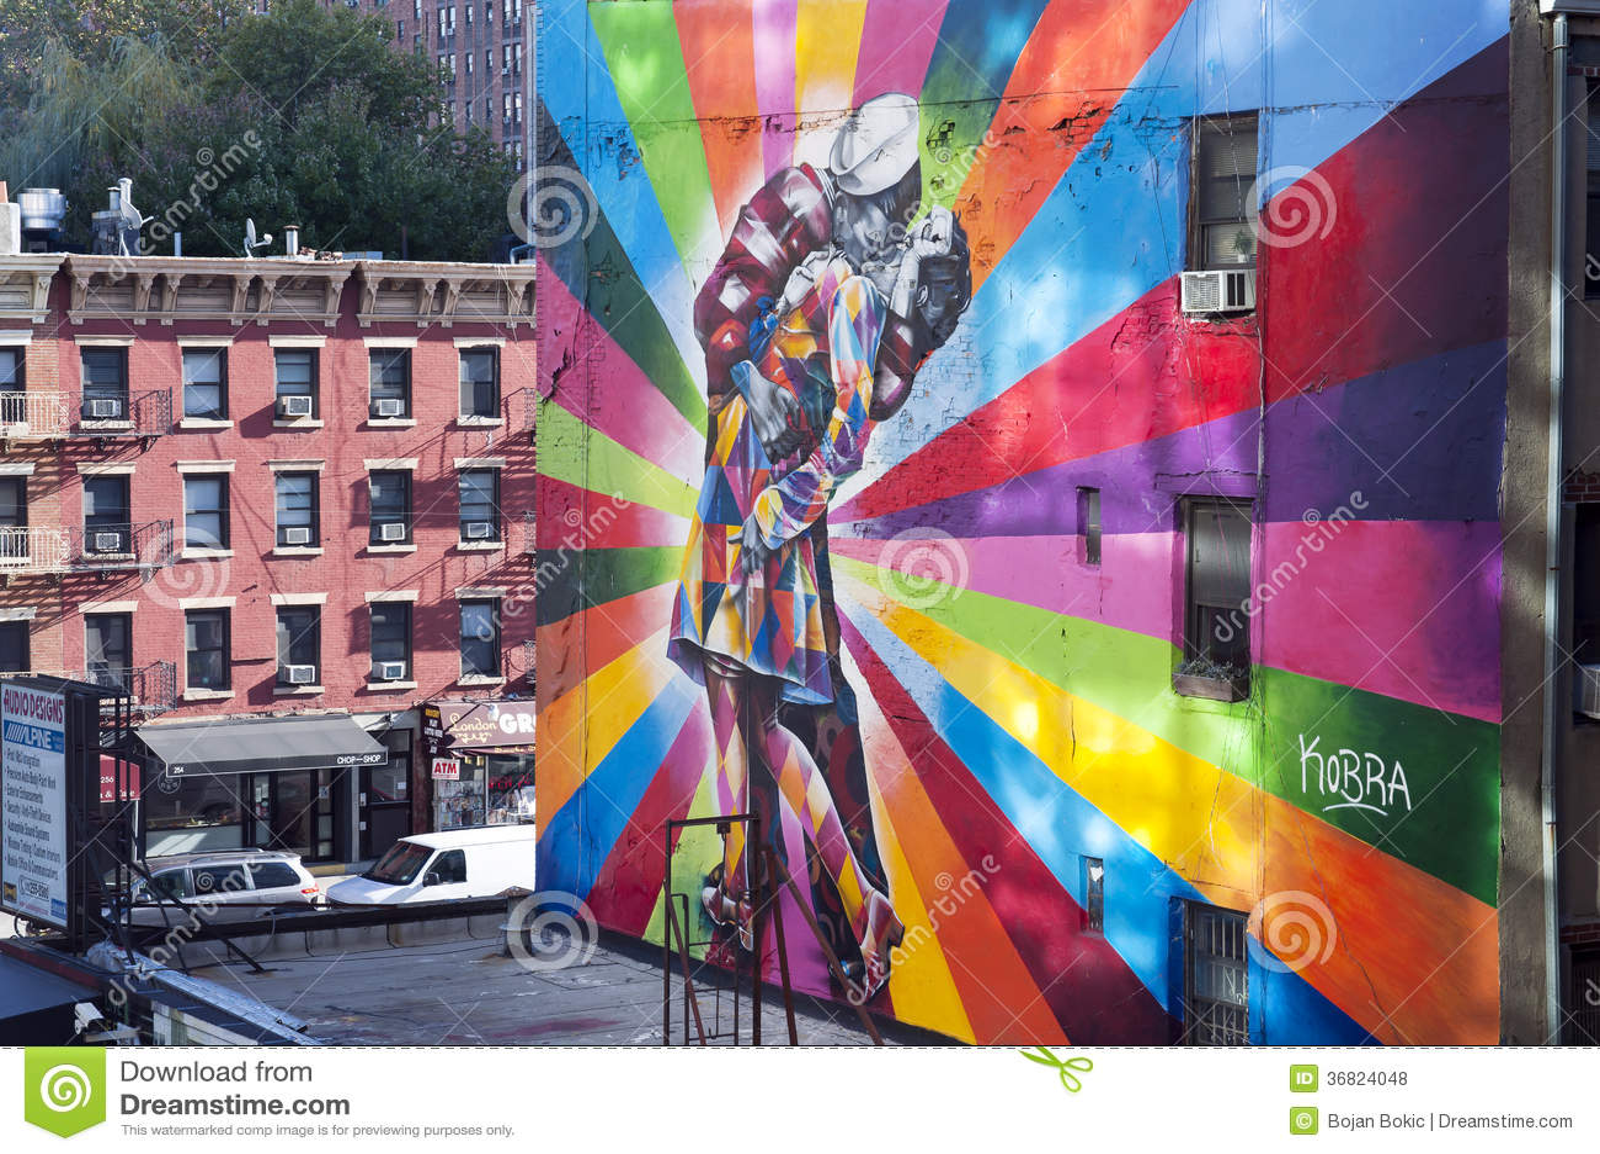 Foto Murales New York.Famous Mural New York City Editorial Stock Photo Image Of